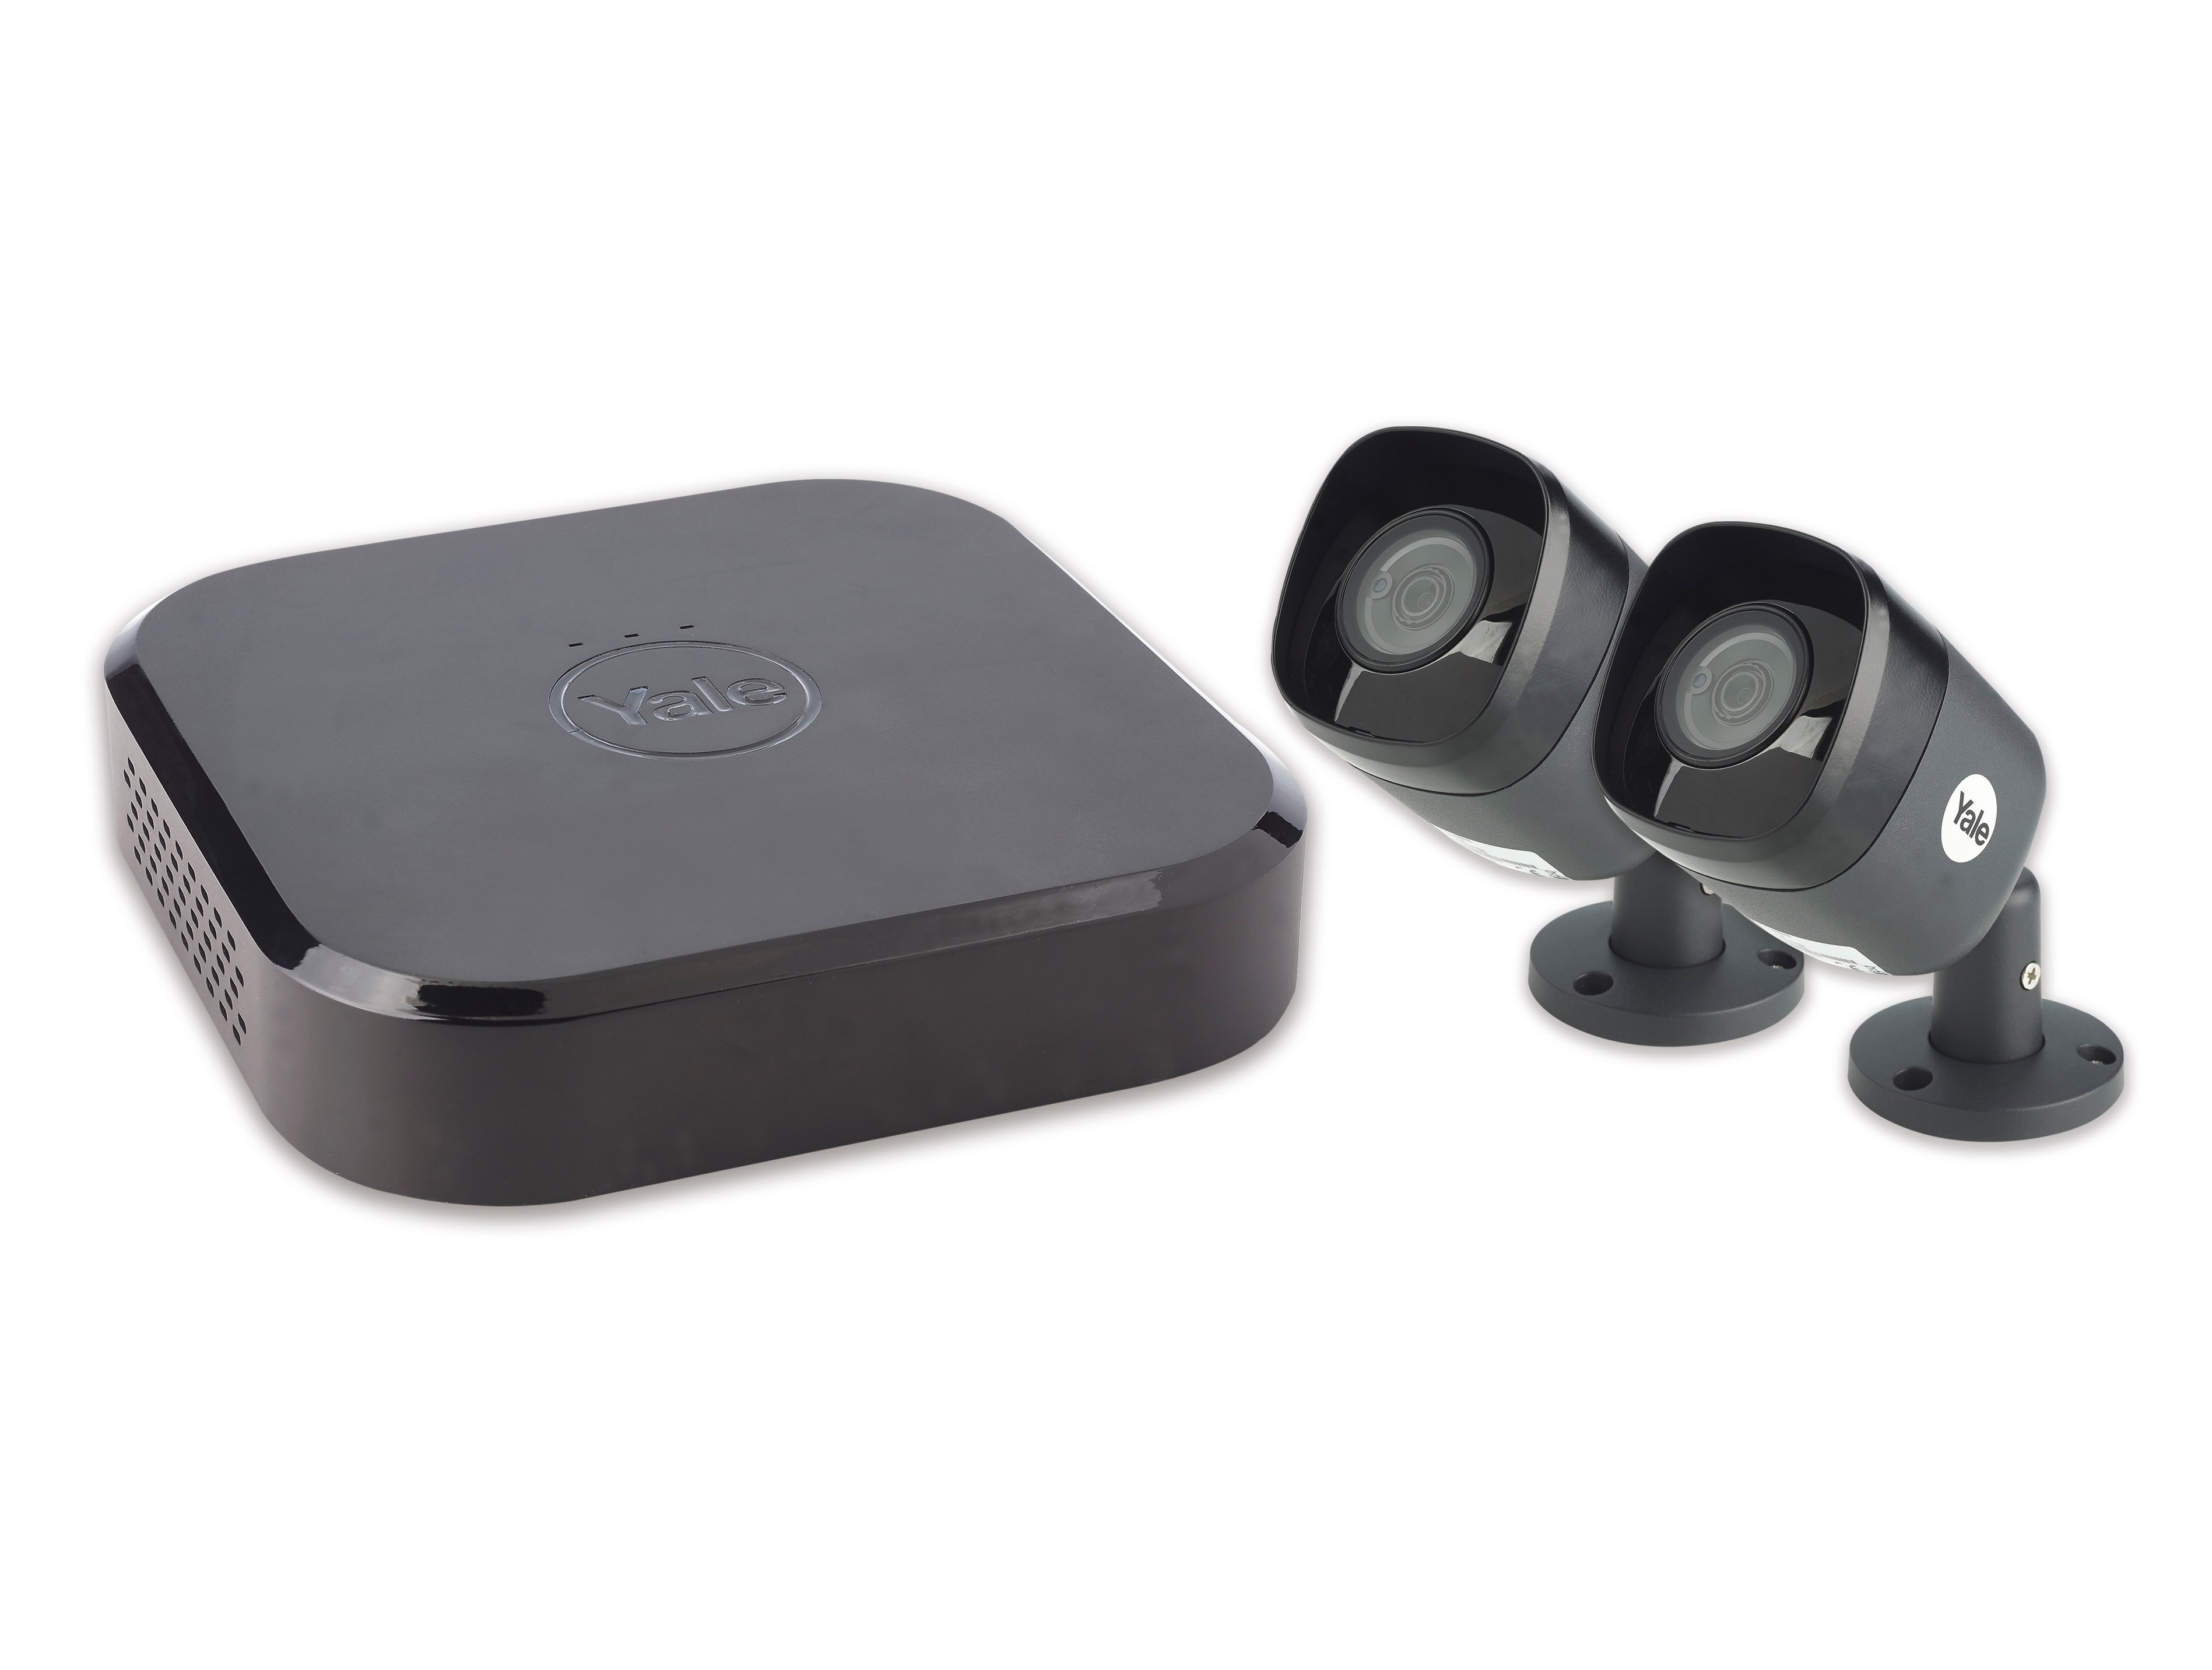 Zestaw Yale Smart Home CCTV